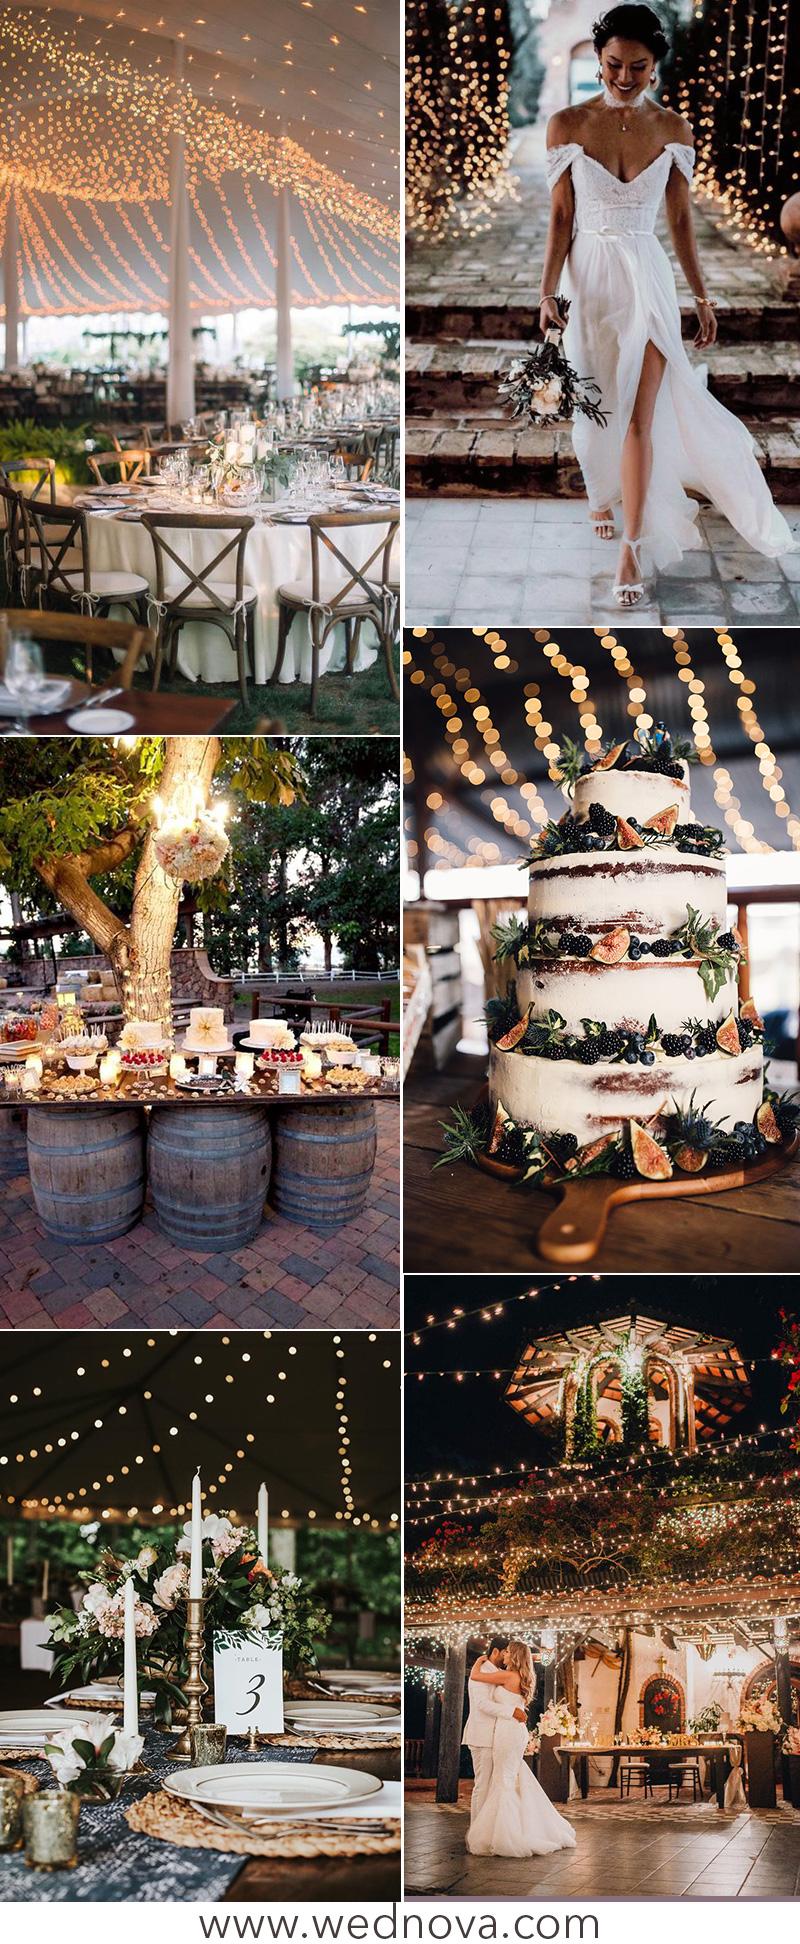 Boho Wedding Decor.Top 15 Chic Boho Wedding Ideas Inspired Your Wedding Wednova Blog